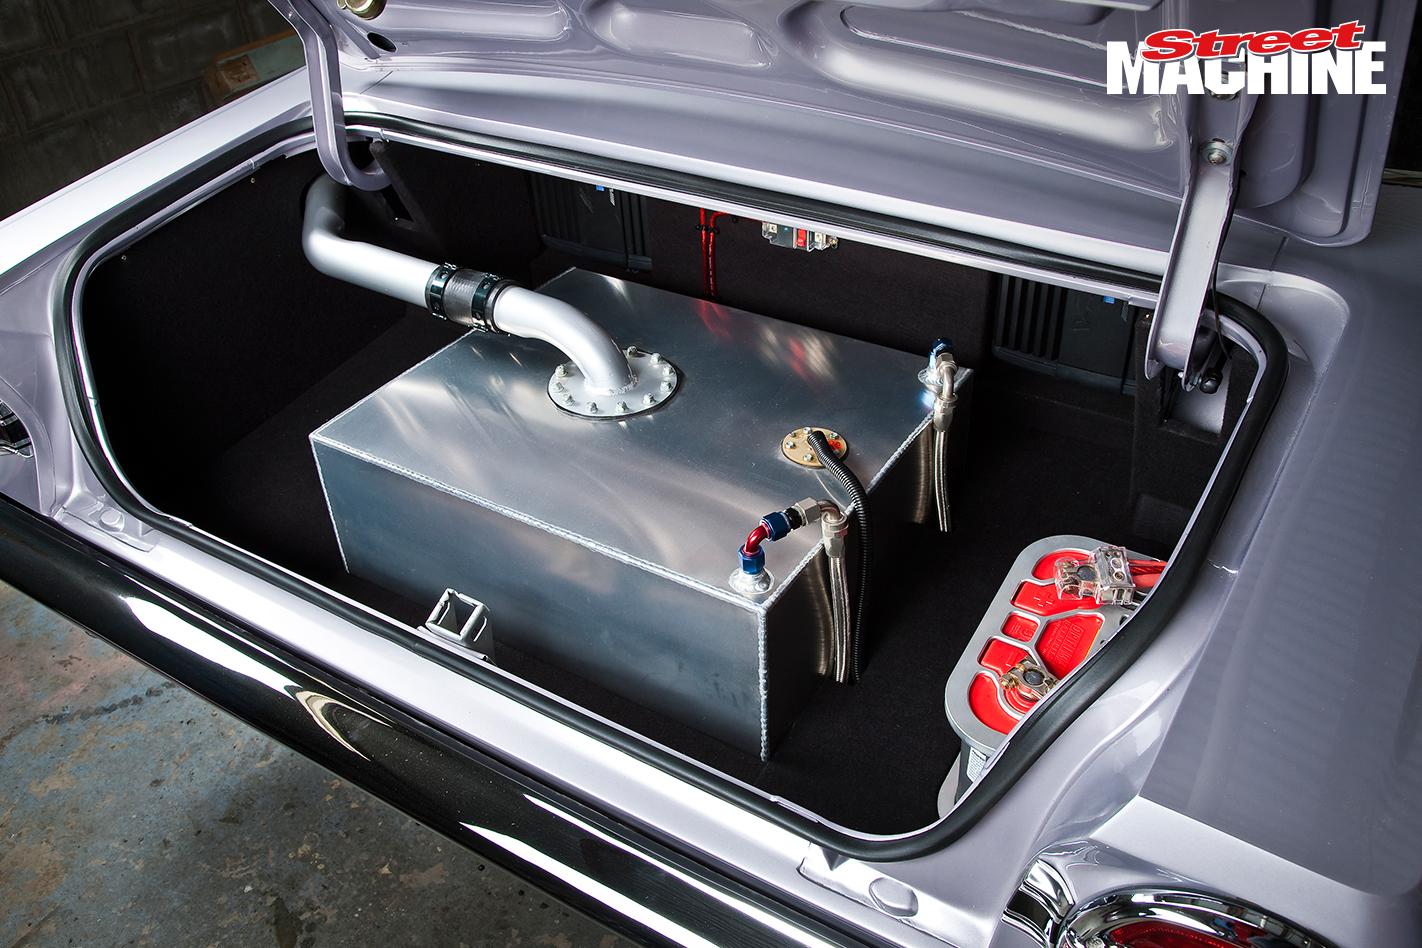 Ford XT Fairmont 10 Nw